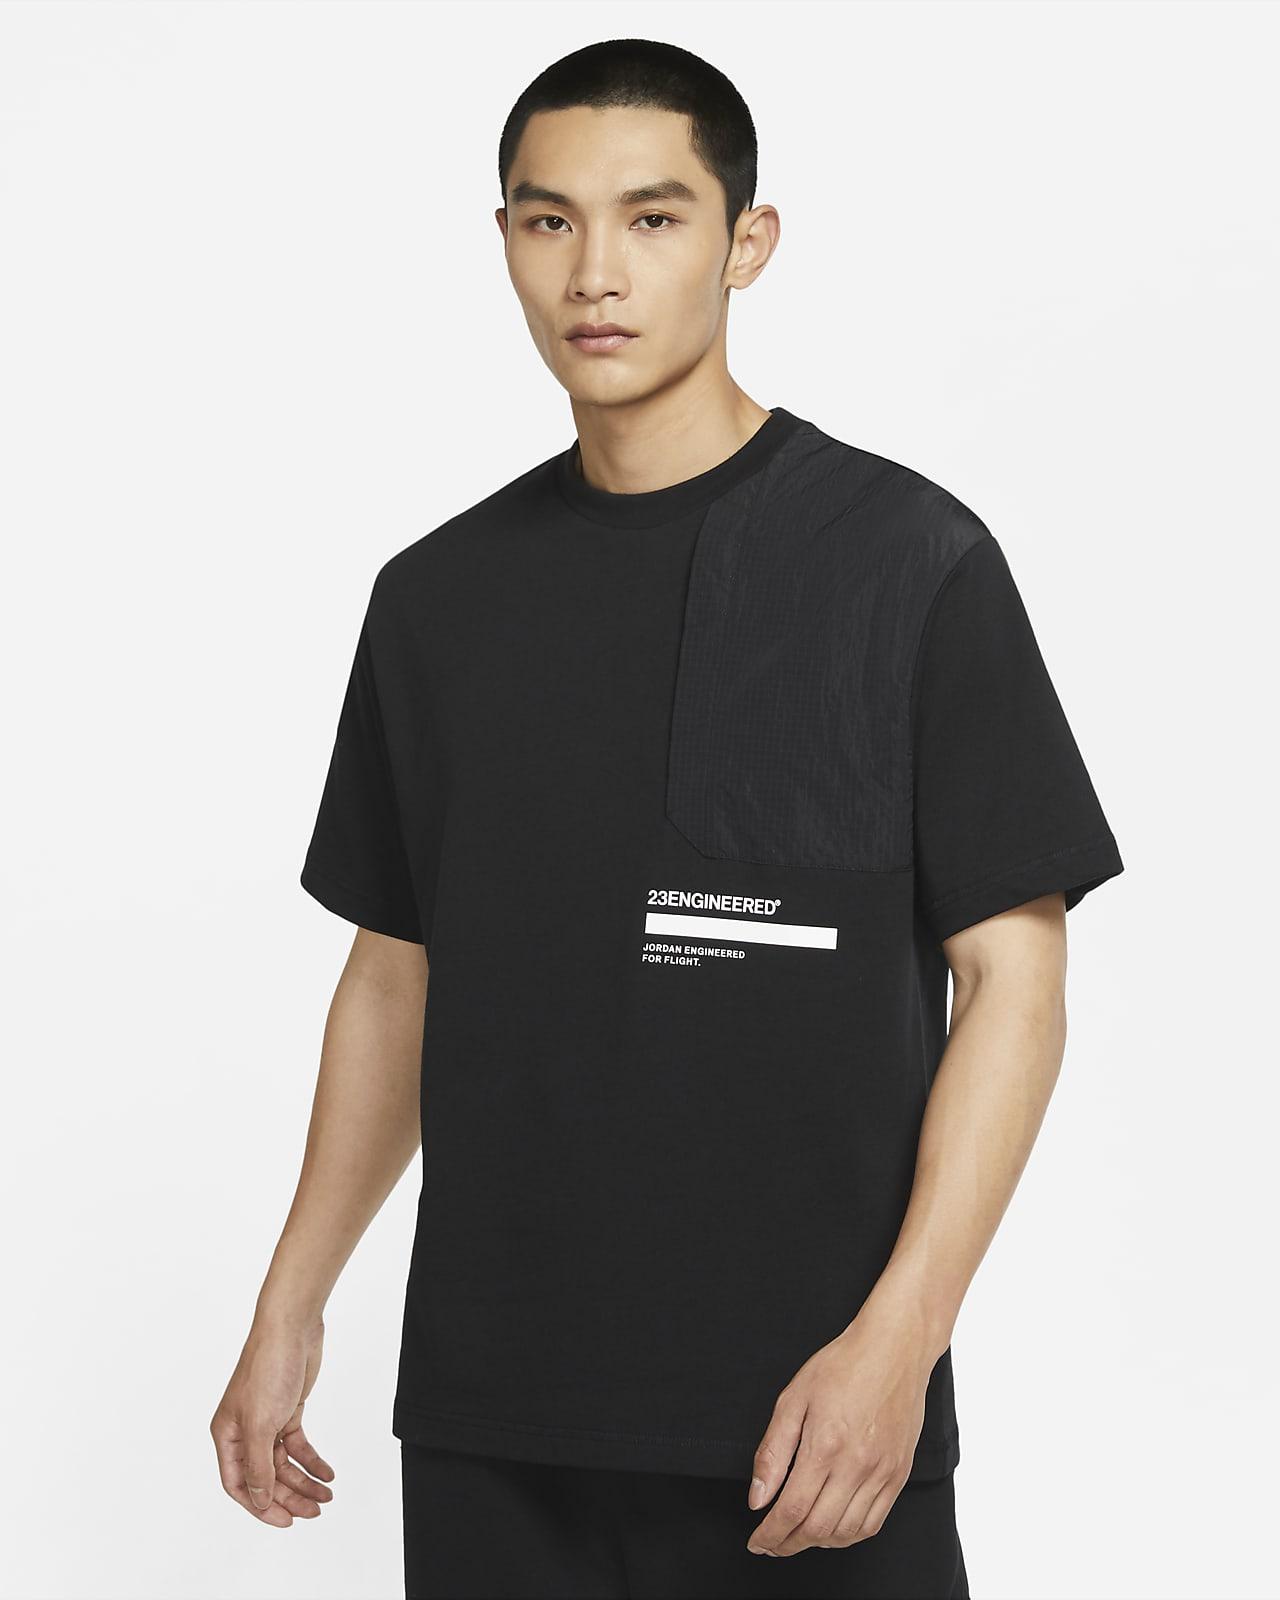 Jordan 23 Engineered 男子短袖上衣